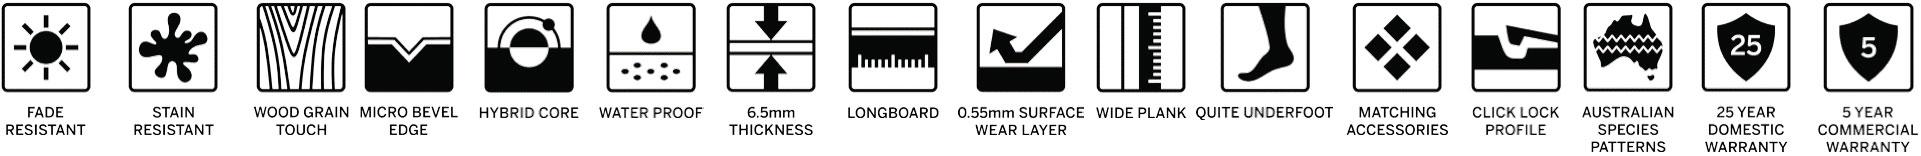 Ornato Hybrid Waterproof Floor Specifications